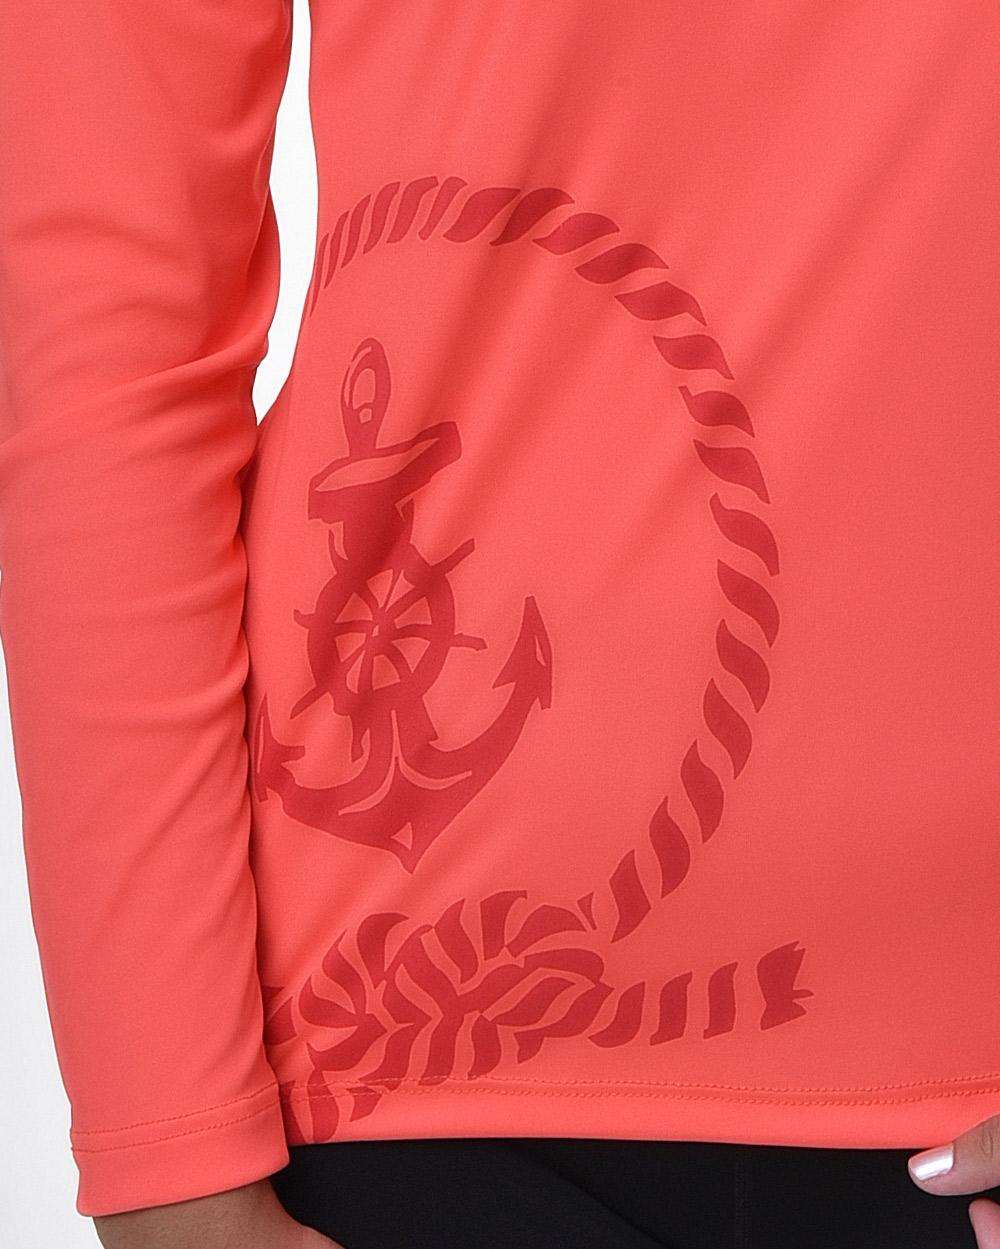 Camiseta Baby Look Proteção Solar - Navy - FPS50+